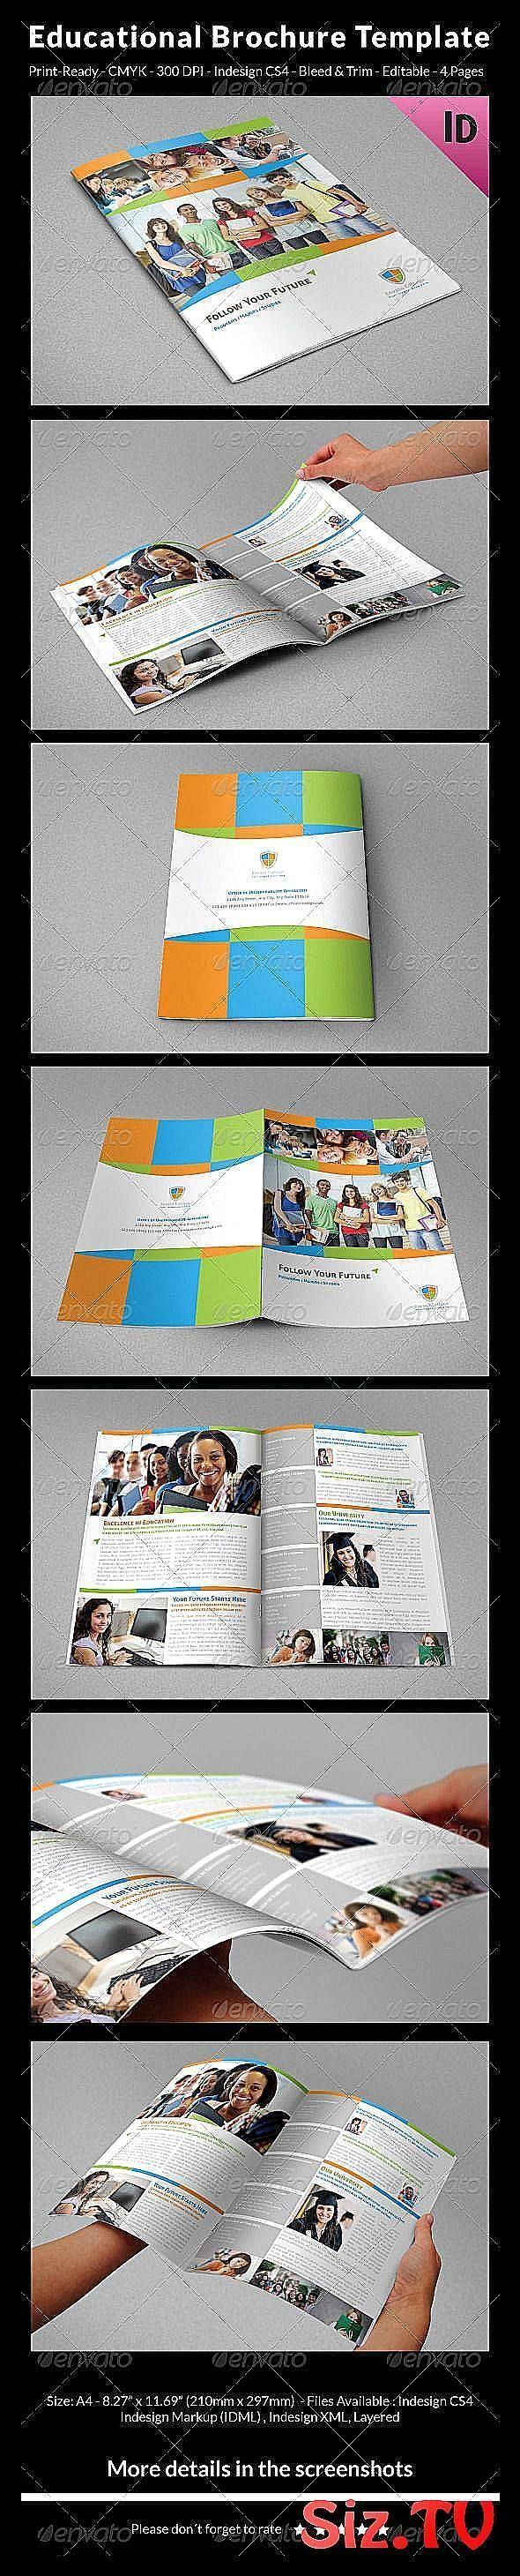 Educational Brochure Template    Informational Brochures Educational Brochure Te…